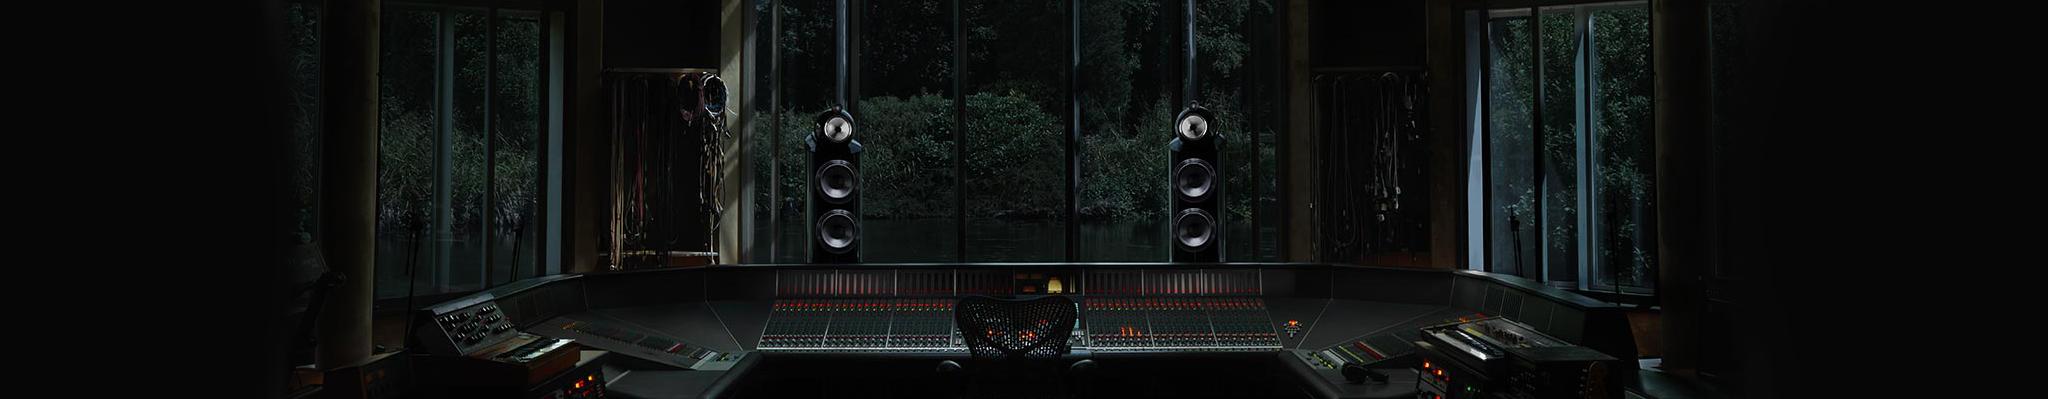 800-d3-studio-category-banner